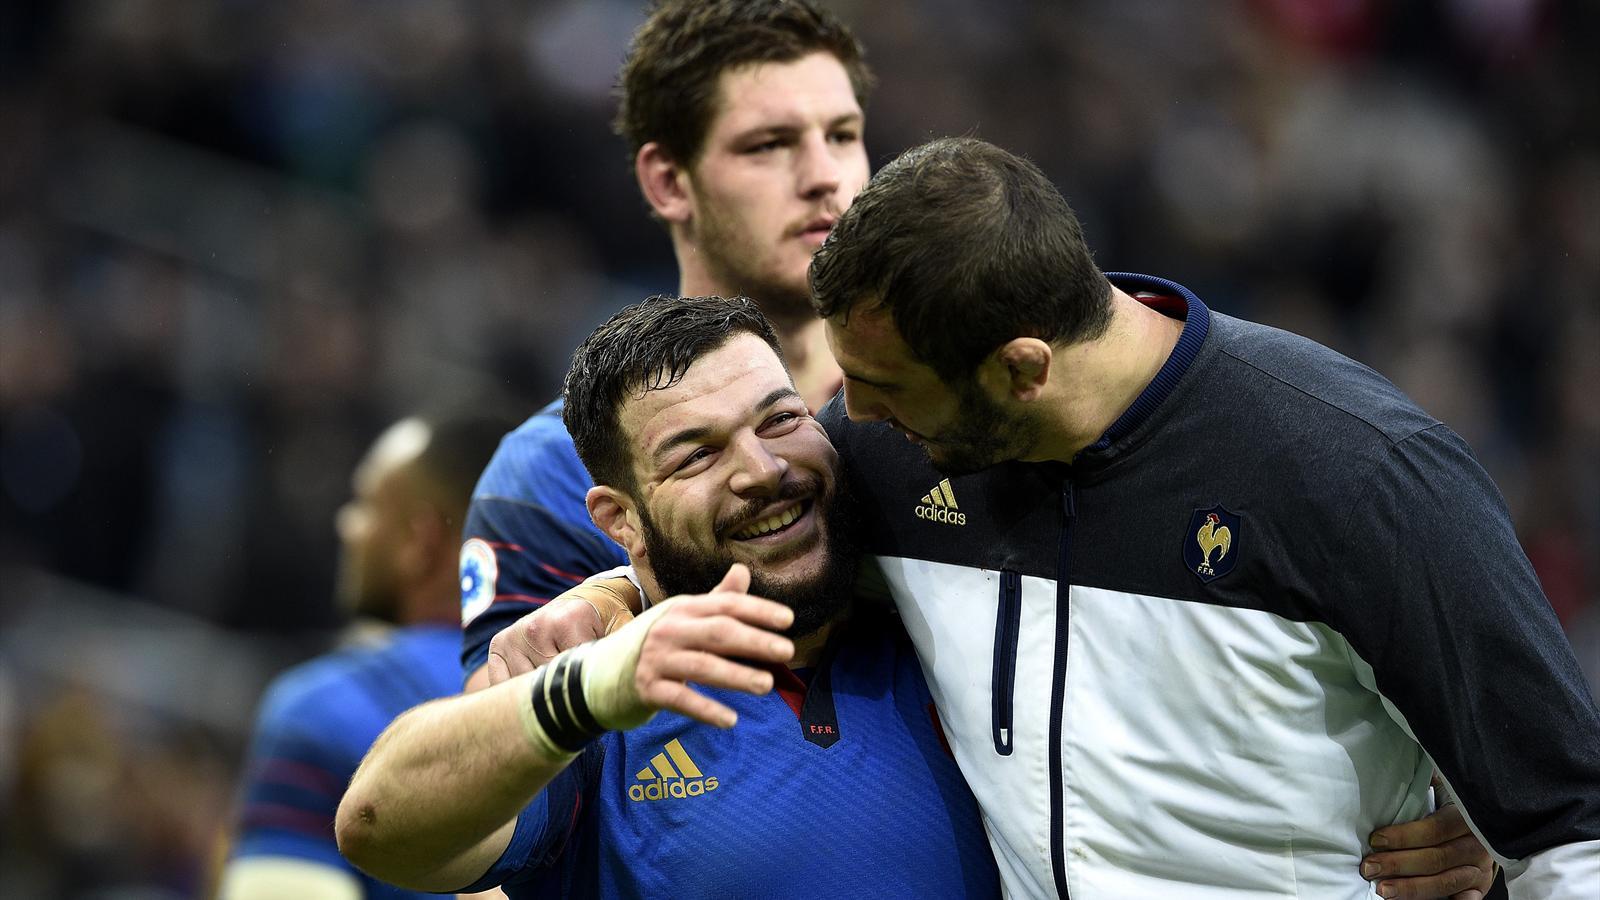 Rabah Slimani et Yoann Maestri (XV de France) - 13 février 2016